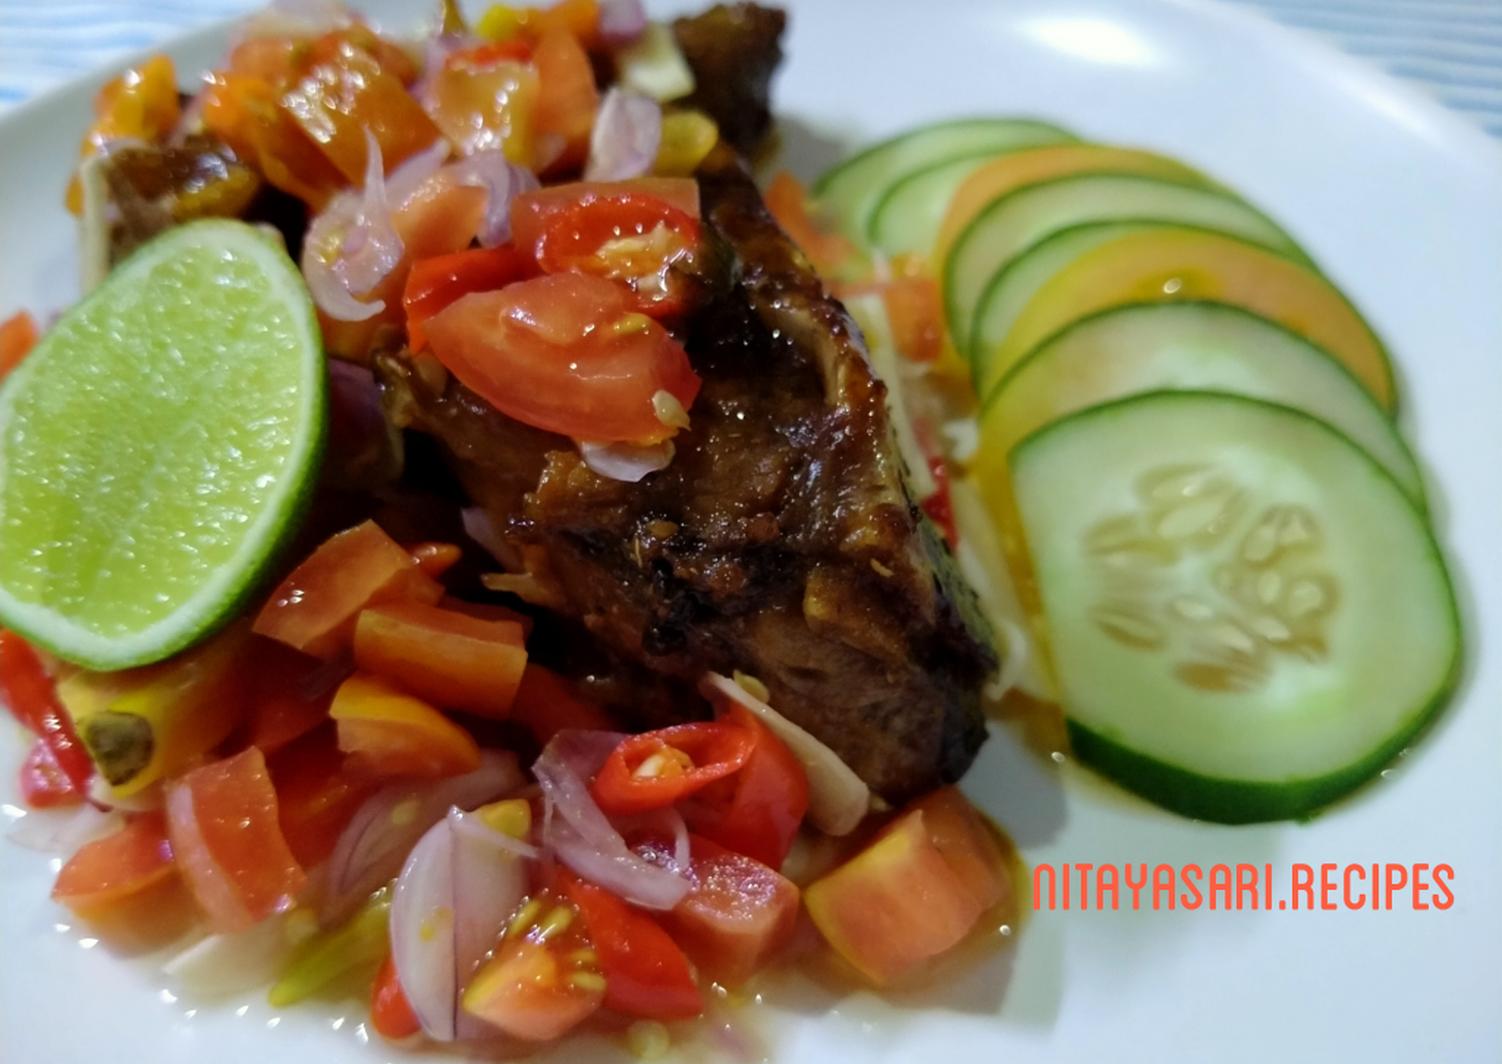 Resep Ikan Bakar Trakulu Sambal Dabu Dabu Recipe In 2020 Food Beef Sambal